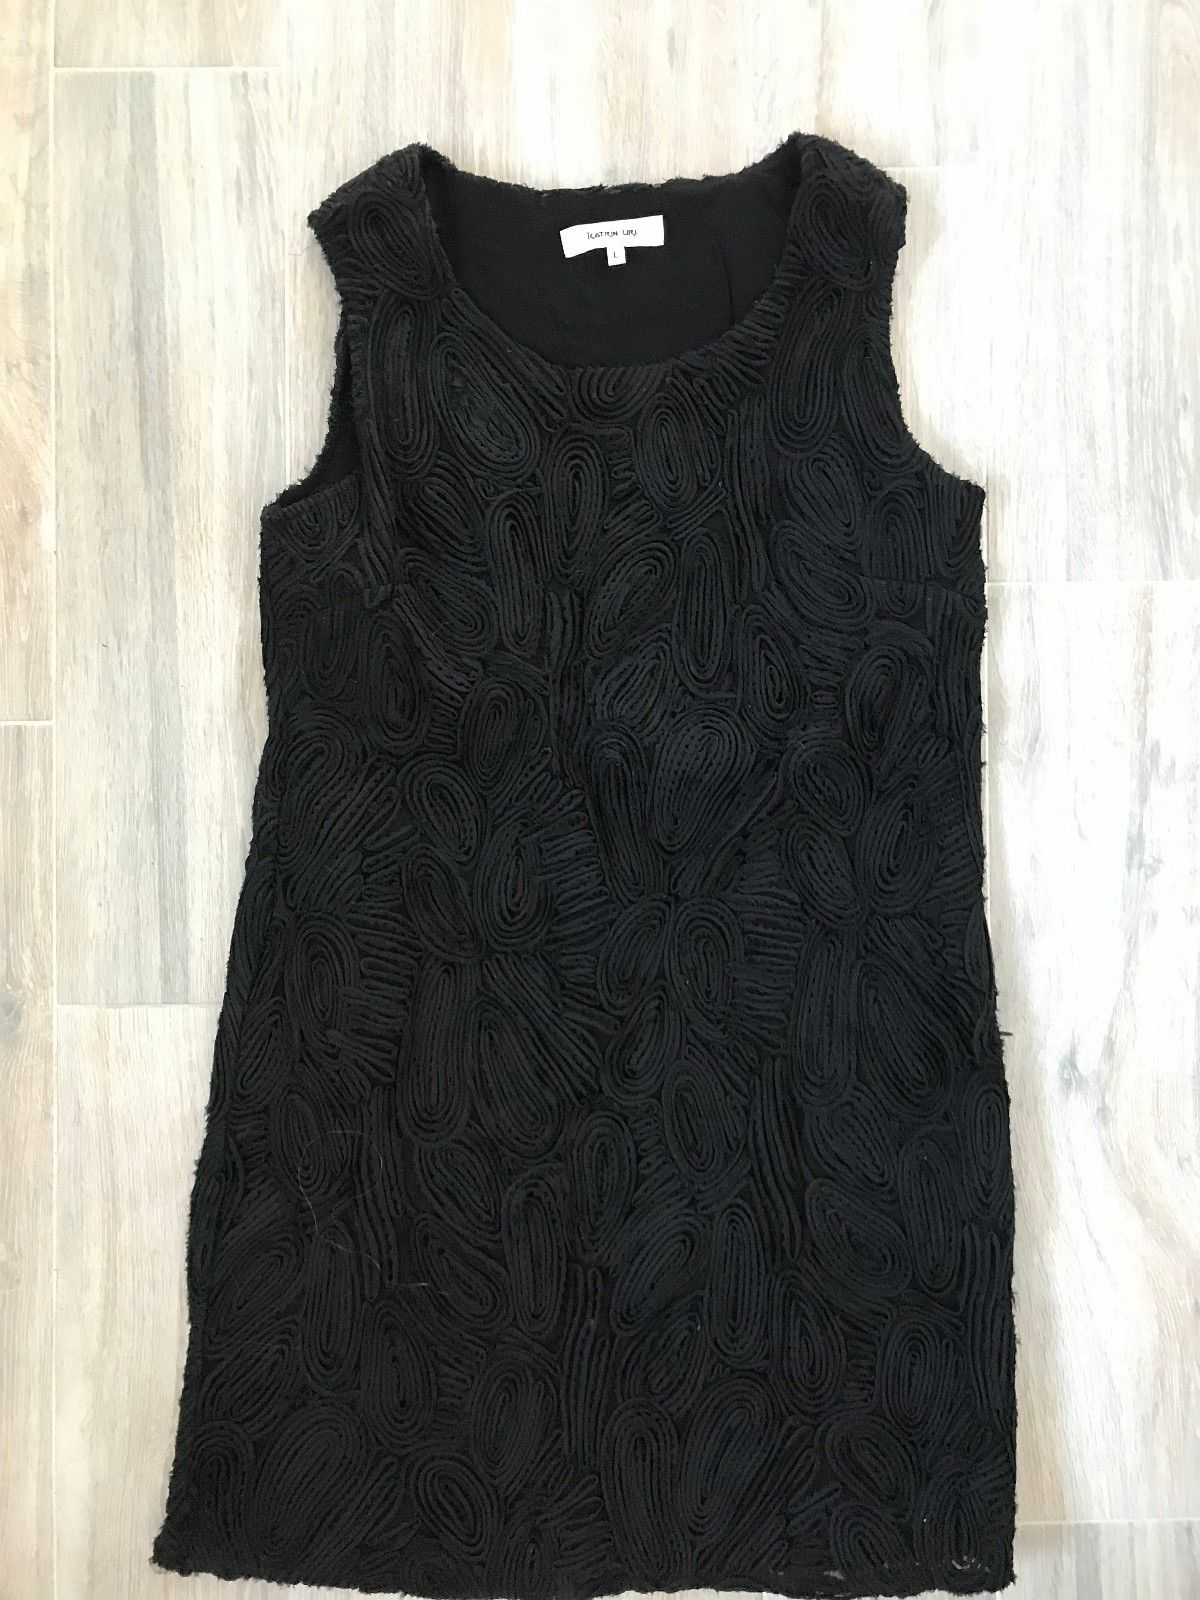 Katrin Uri kjole str L   FINN.no